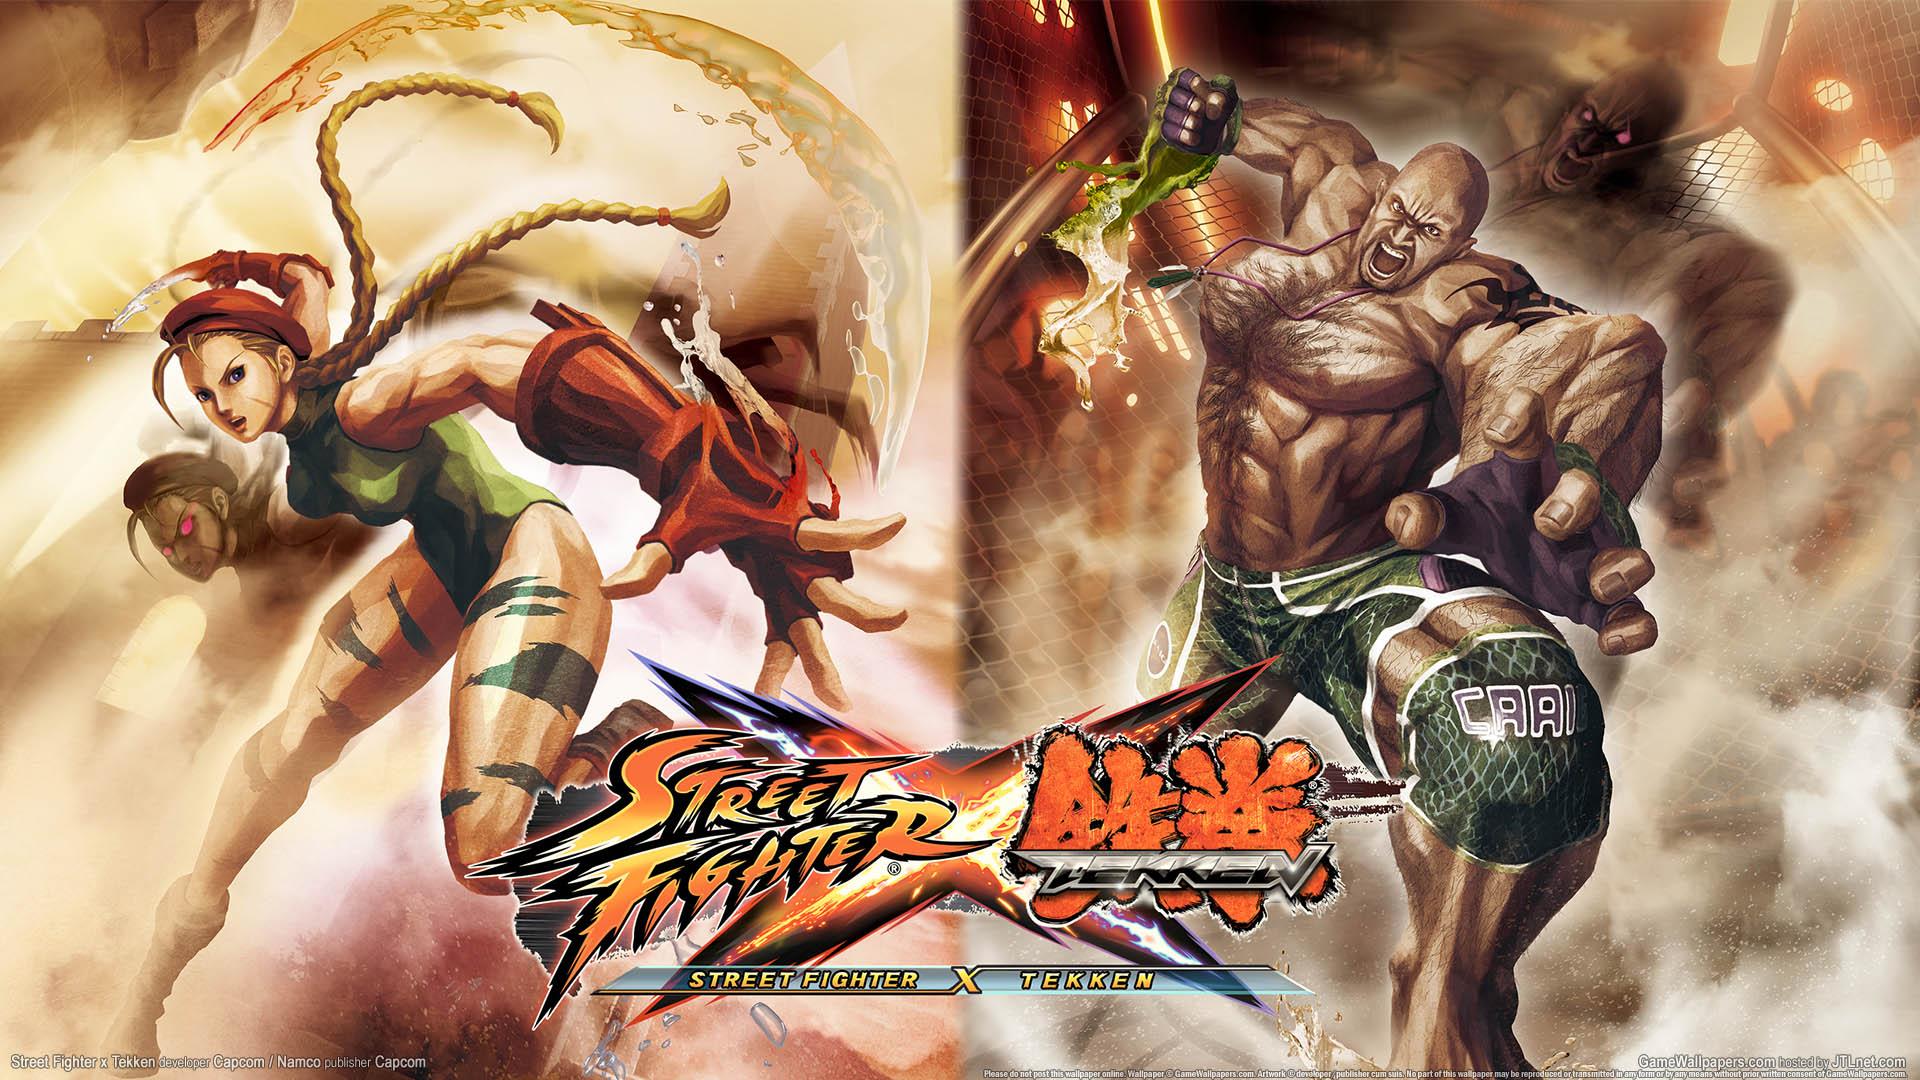 Street Fighter x Tekken Hintergrundbild 01 1920x1080